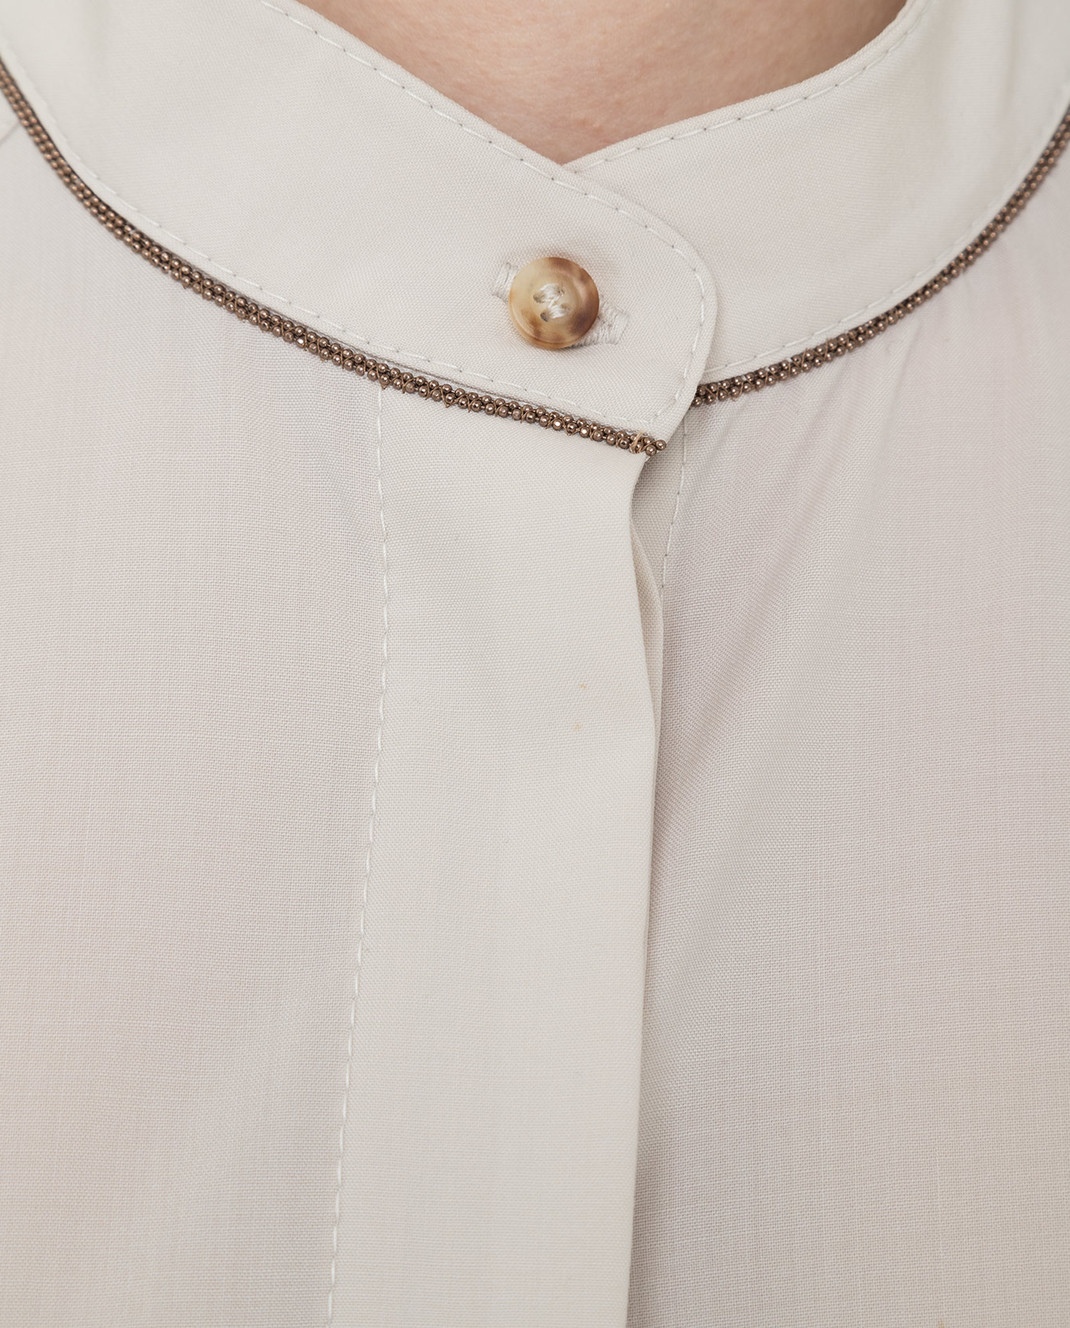 Brunello Cucinelli Светло-бежевое платье из шерсти изображение 5